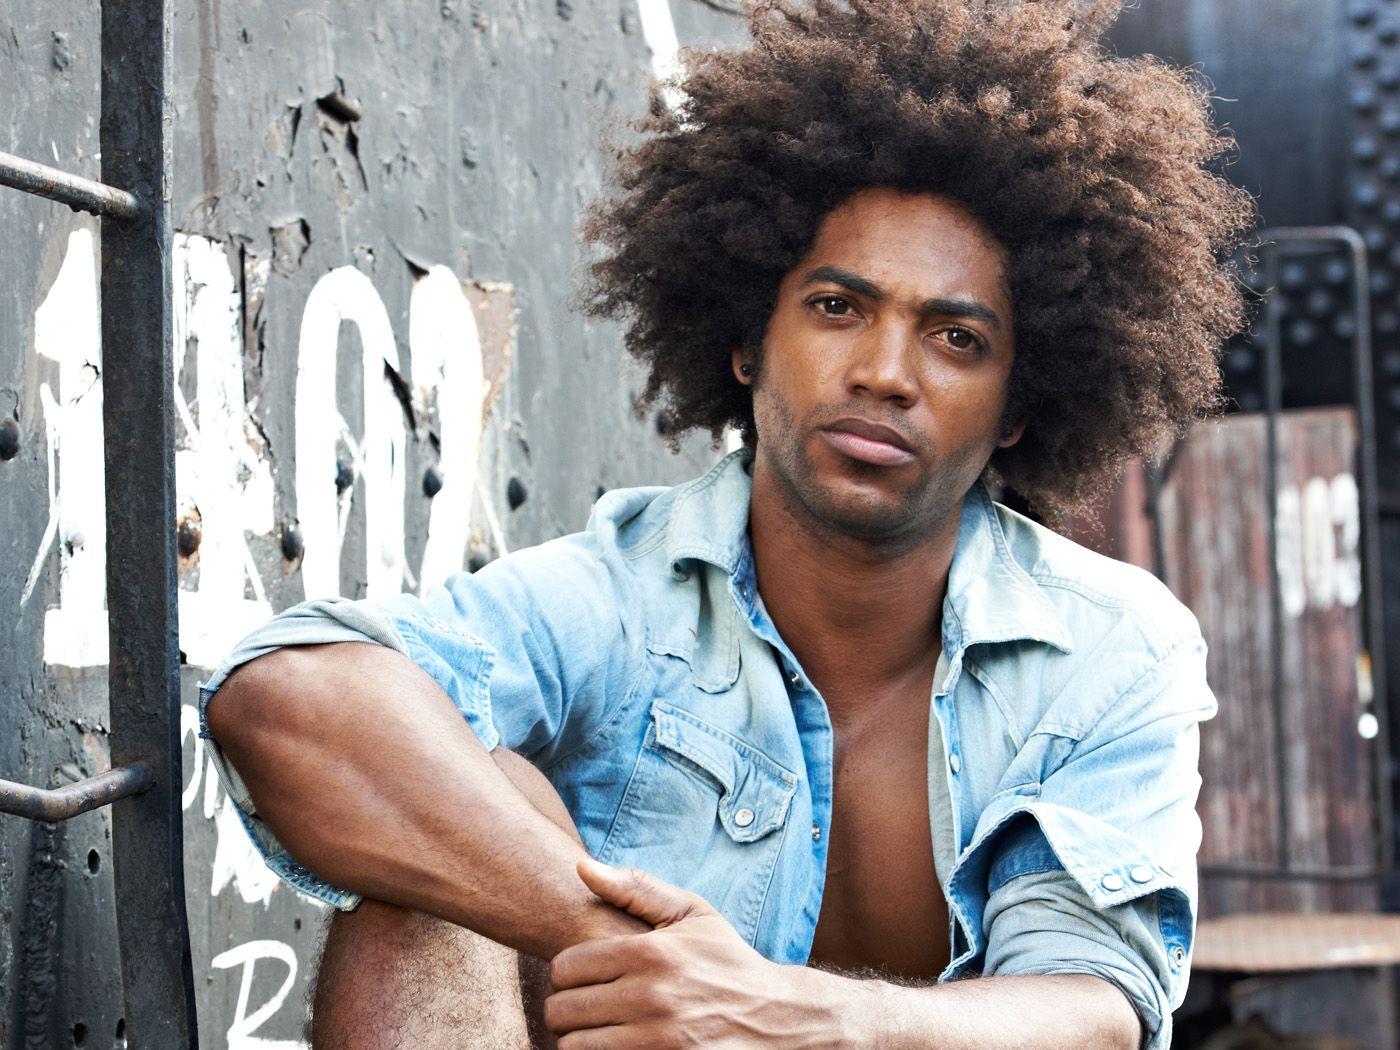 Yosliem Ariosa, black male fashion model from Havana, Cuba.